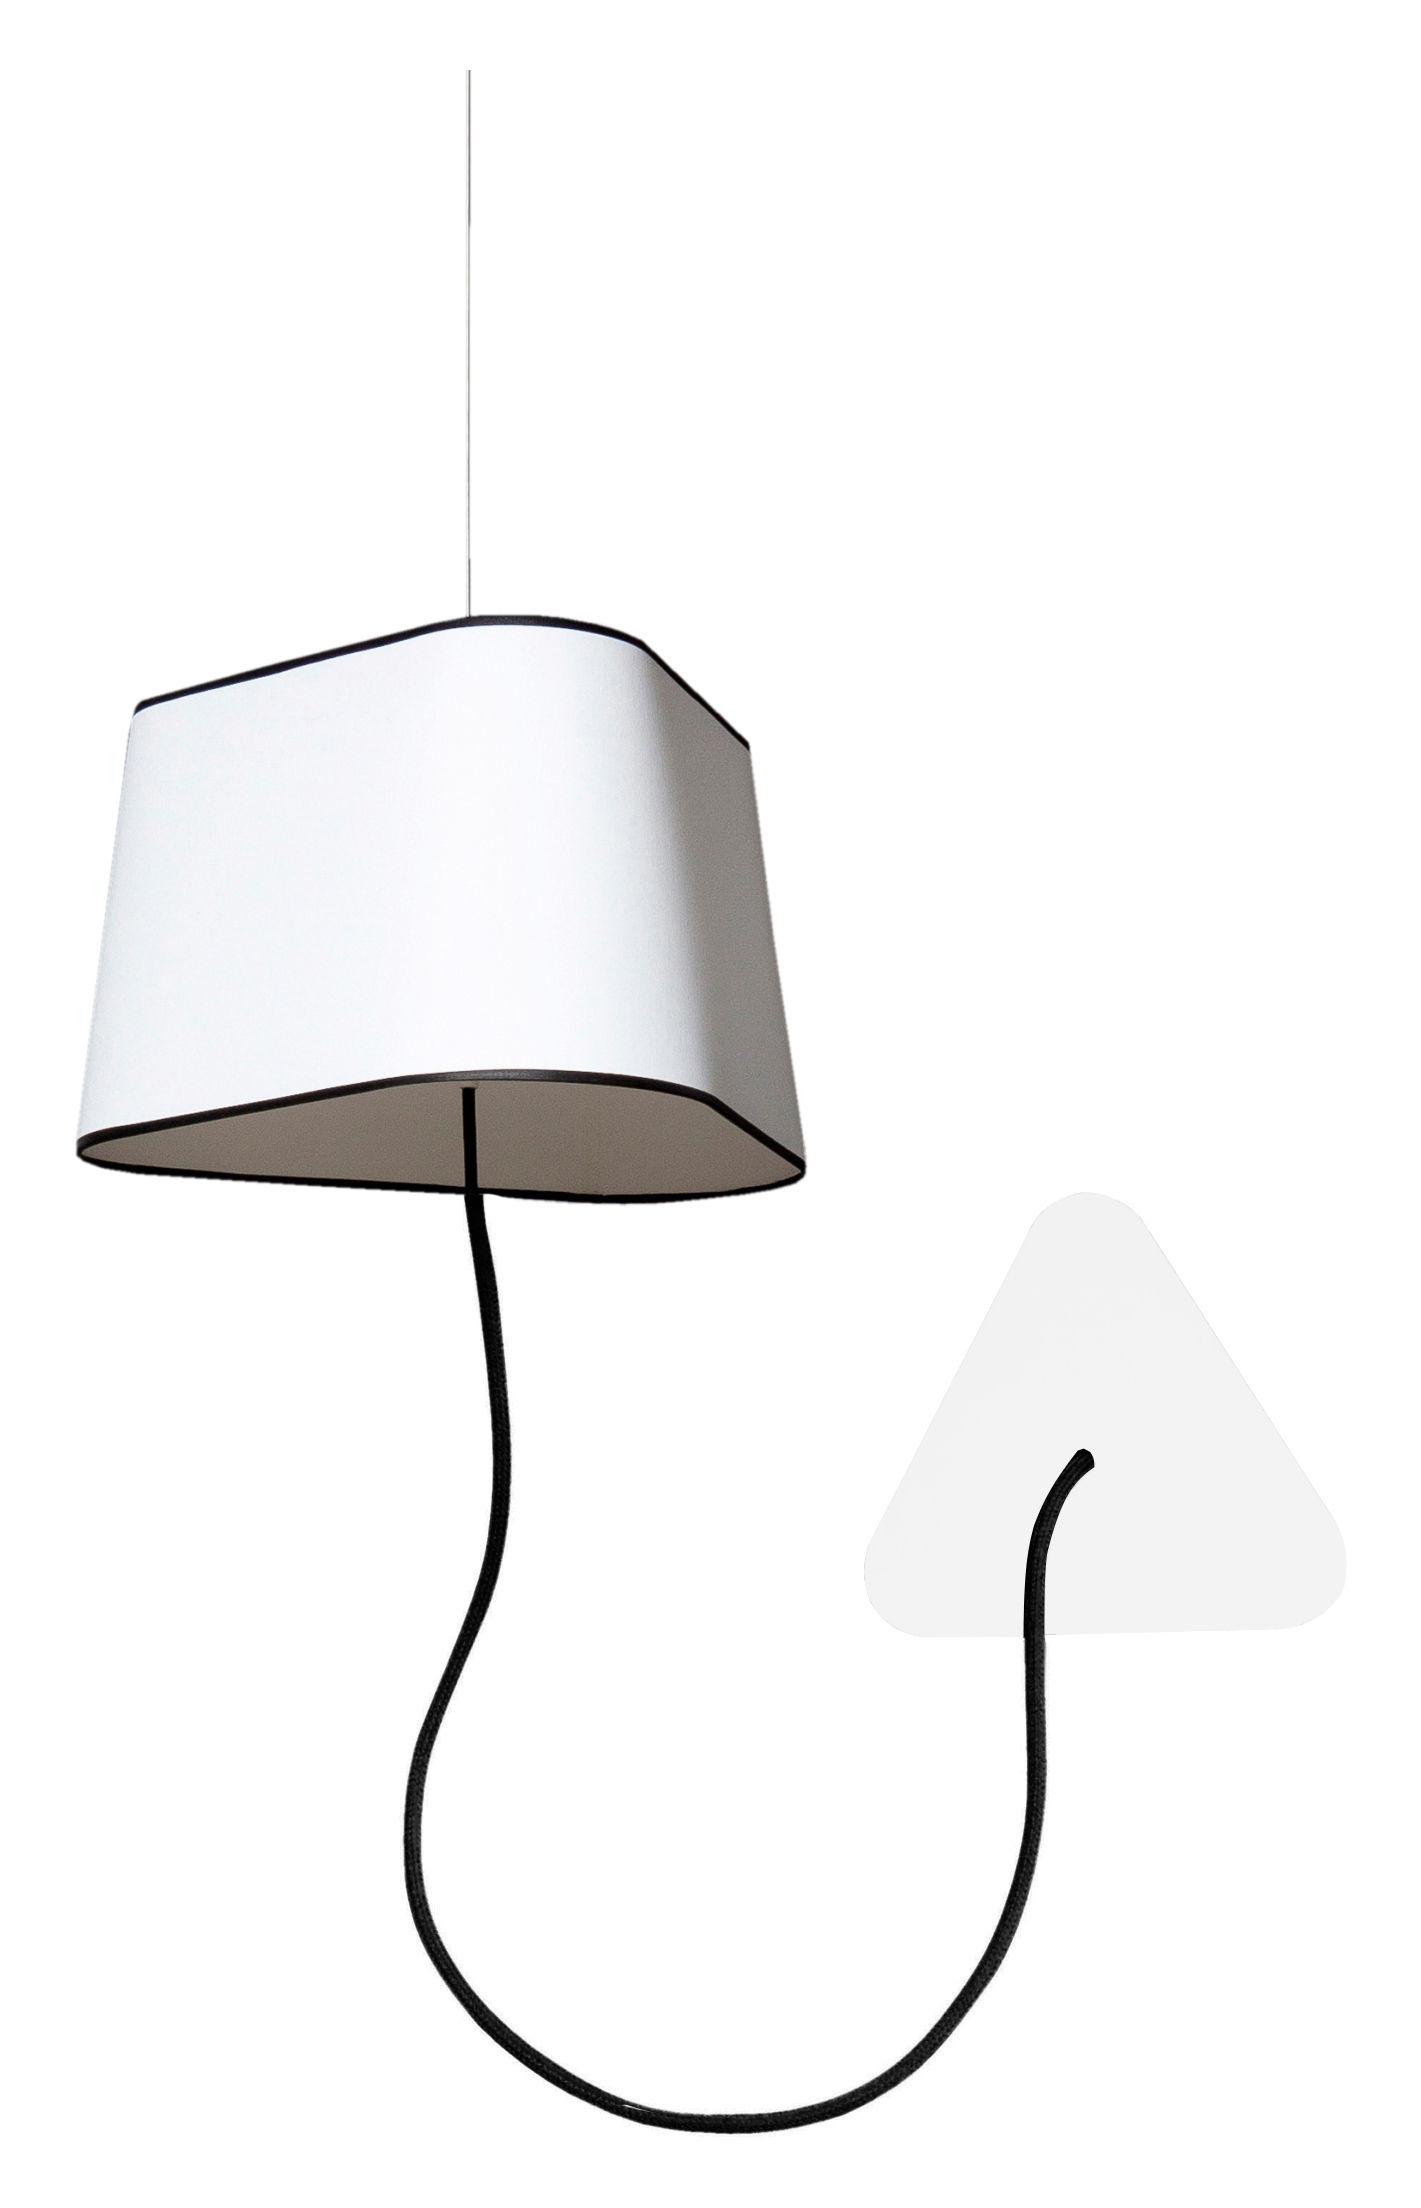 petit nuage l 24 cm deckenbefestigung designheure. Black Bedroom Furniture Sets. Home Design Ideas